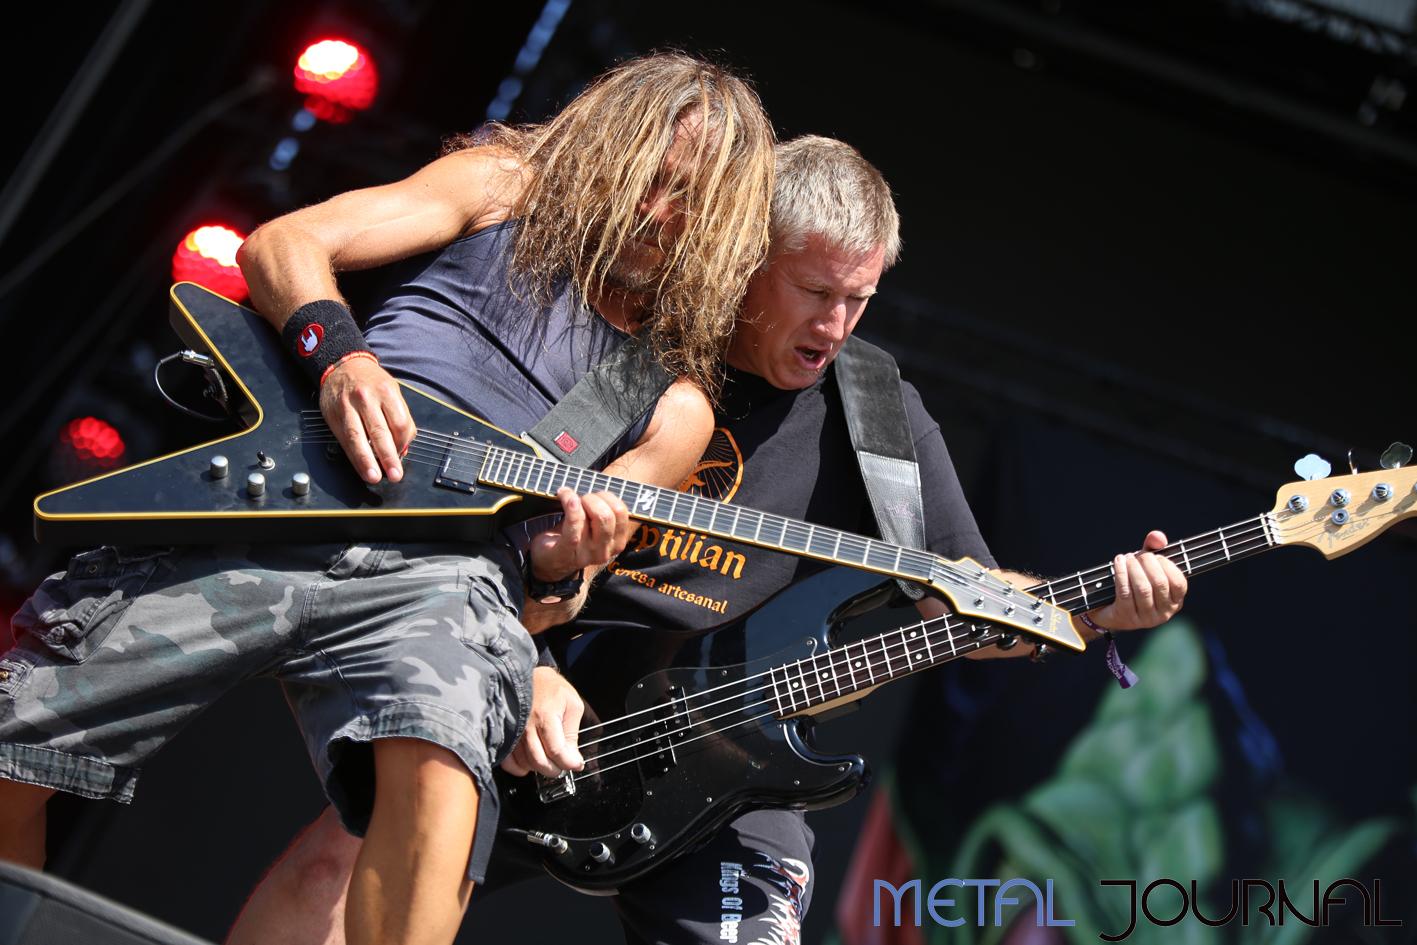 tankard rock fest 18 - metal journal pic 4